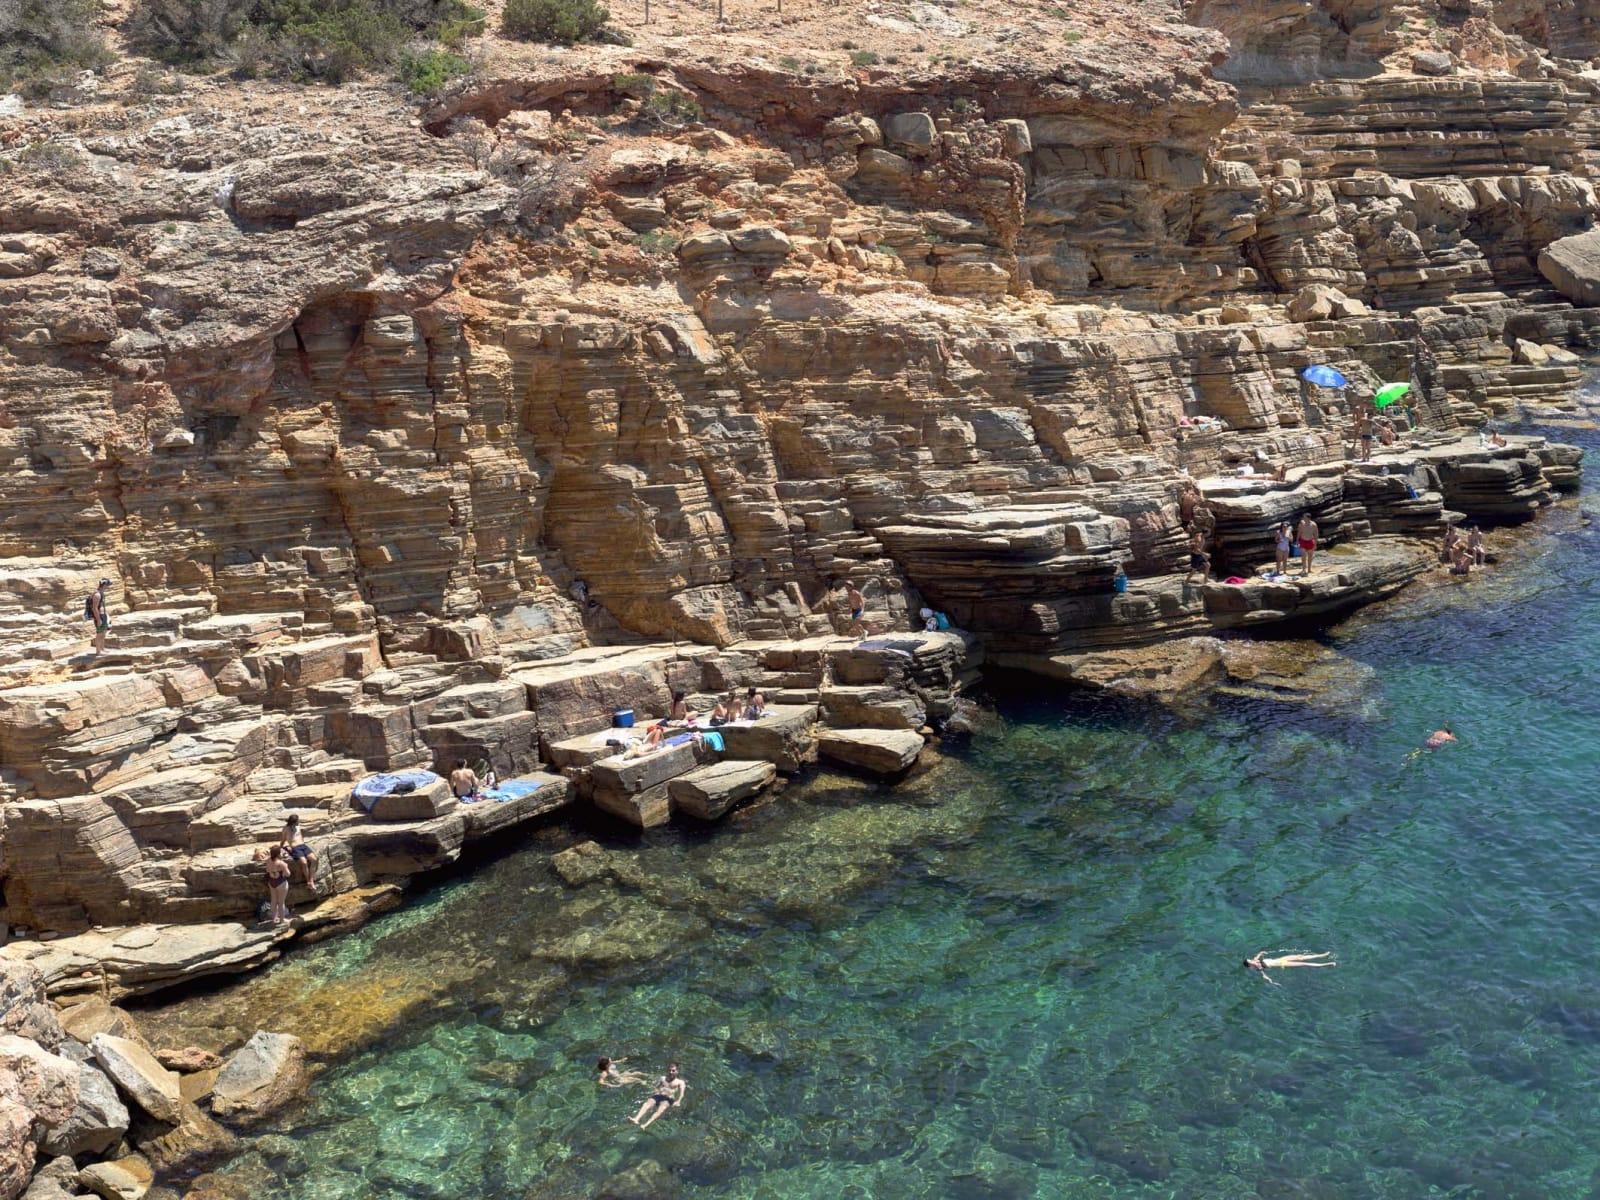 Beachgoers floating in blue water at Cala Llosa South, Ibiza, by Massimo Vitali